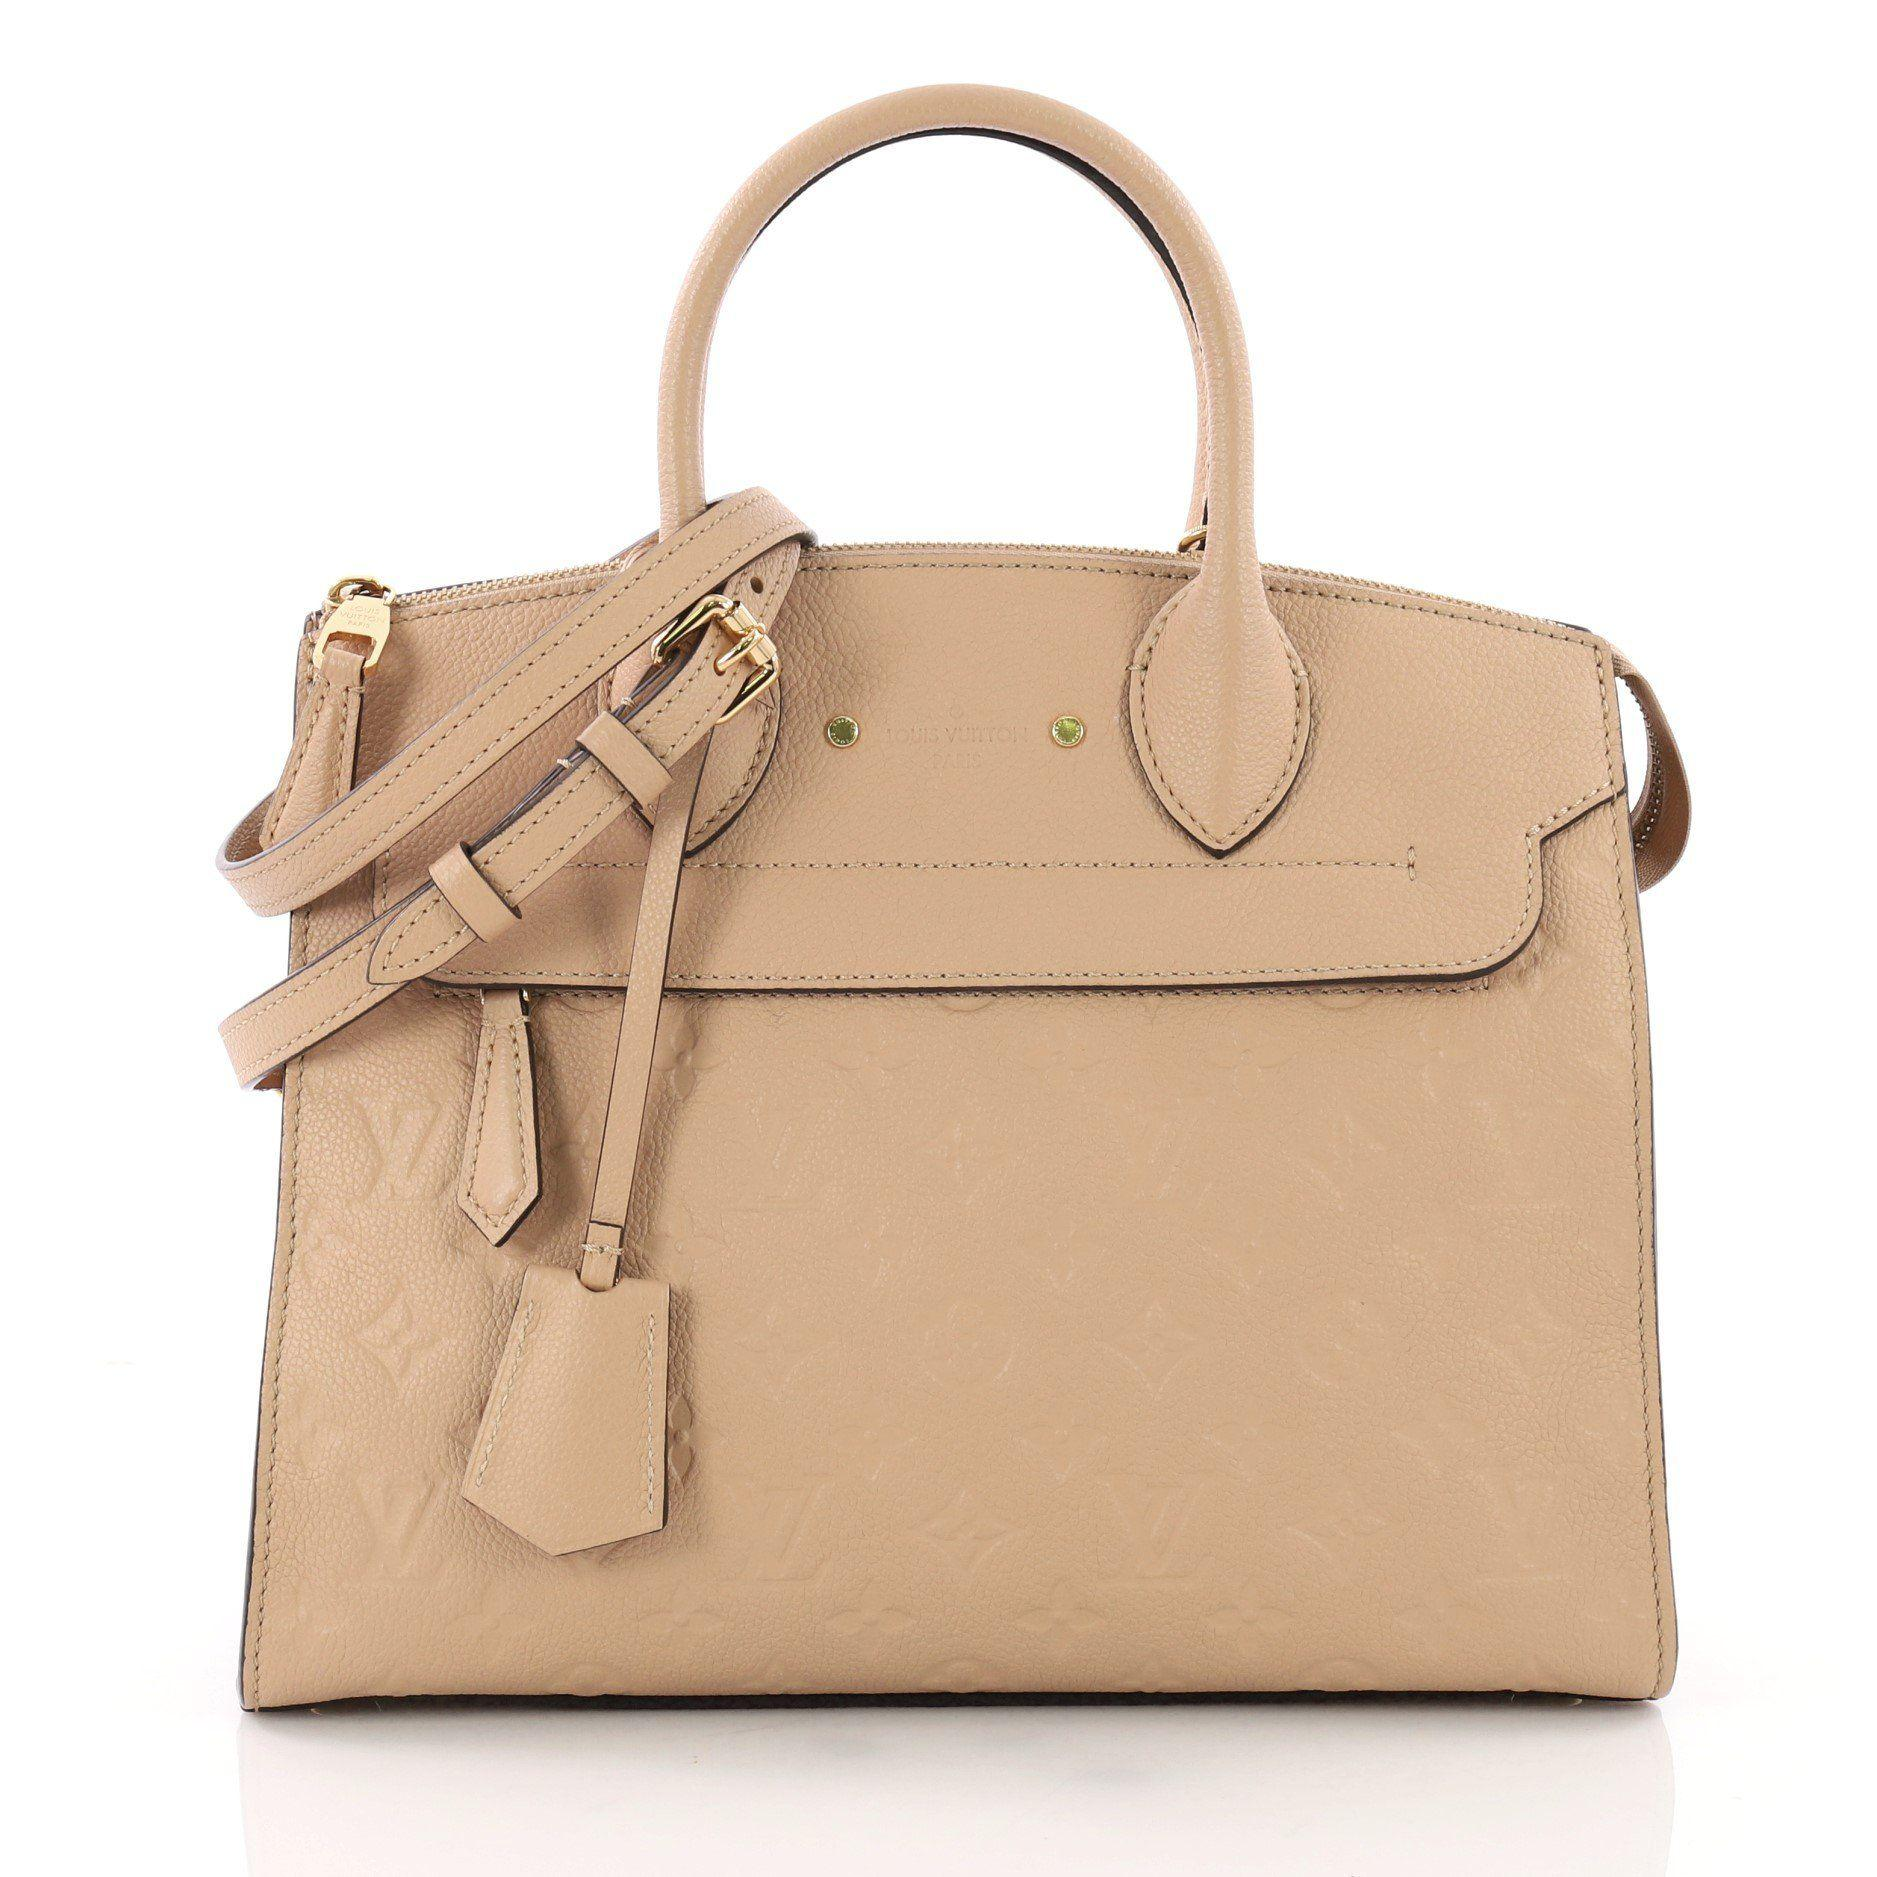 4eabd046e5f Louis Vuitton. Women s Natural Pont Neuf Handbag Monogram Empreinte Leather  Mm